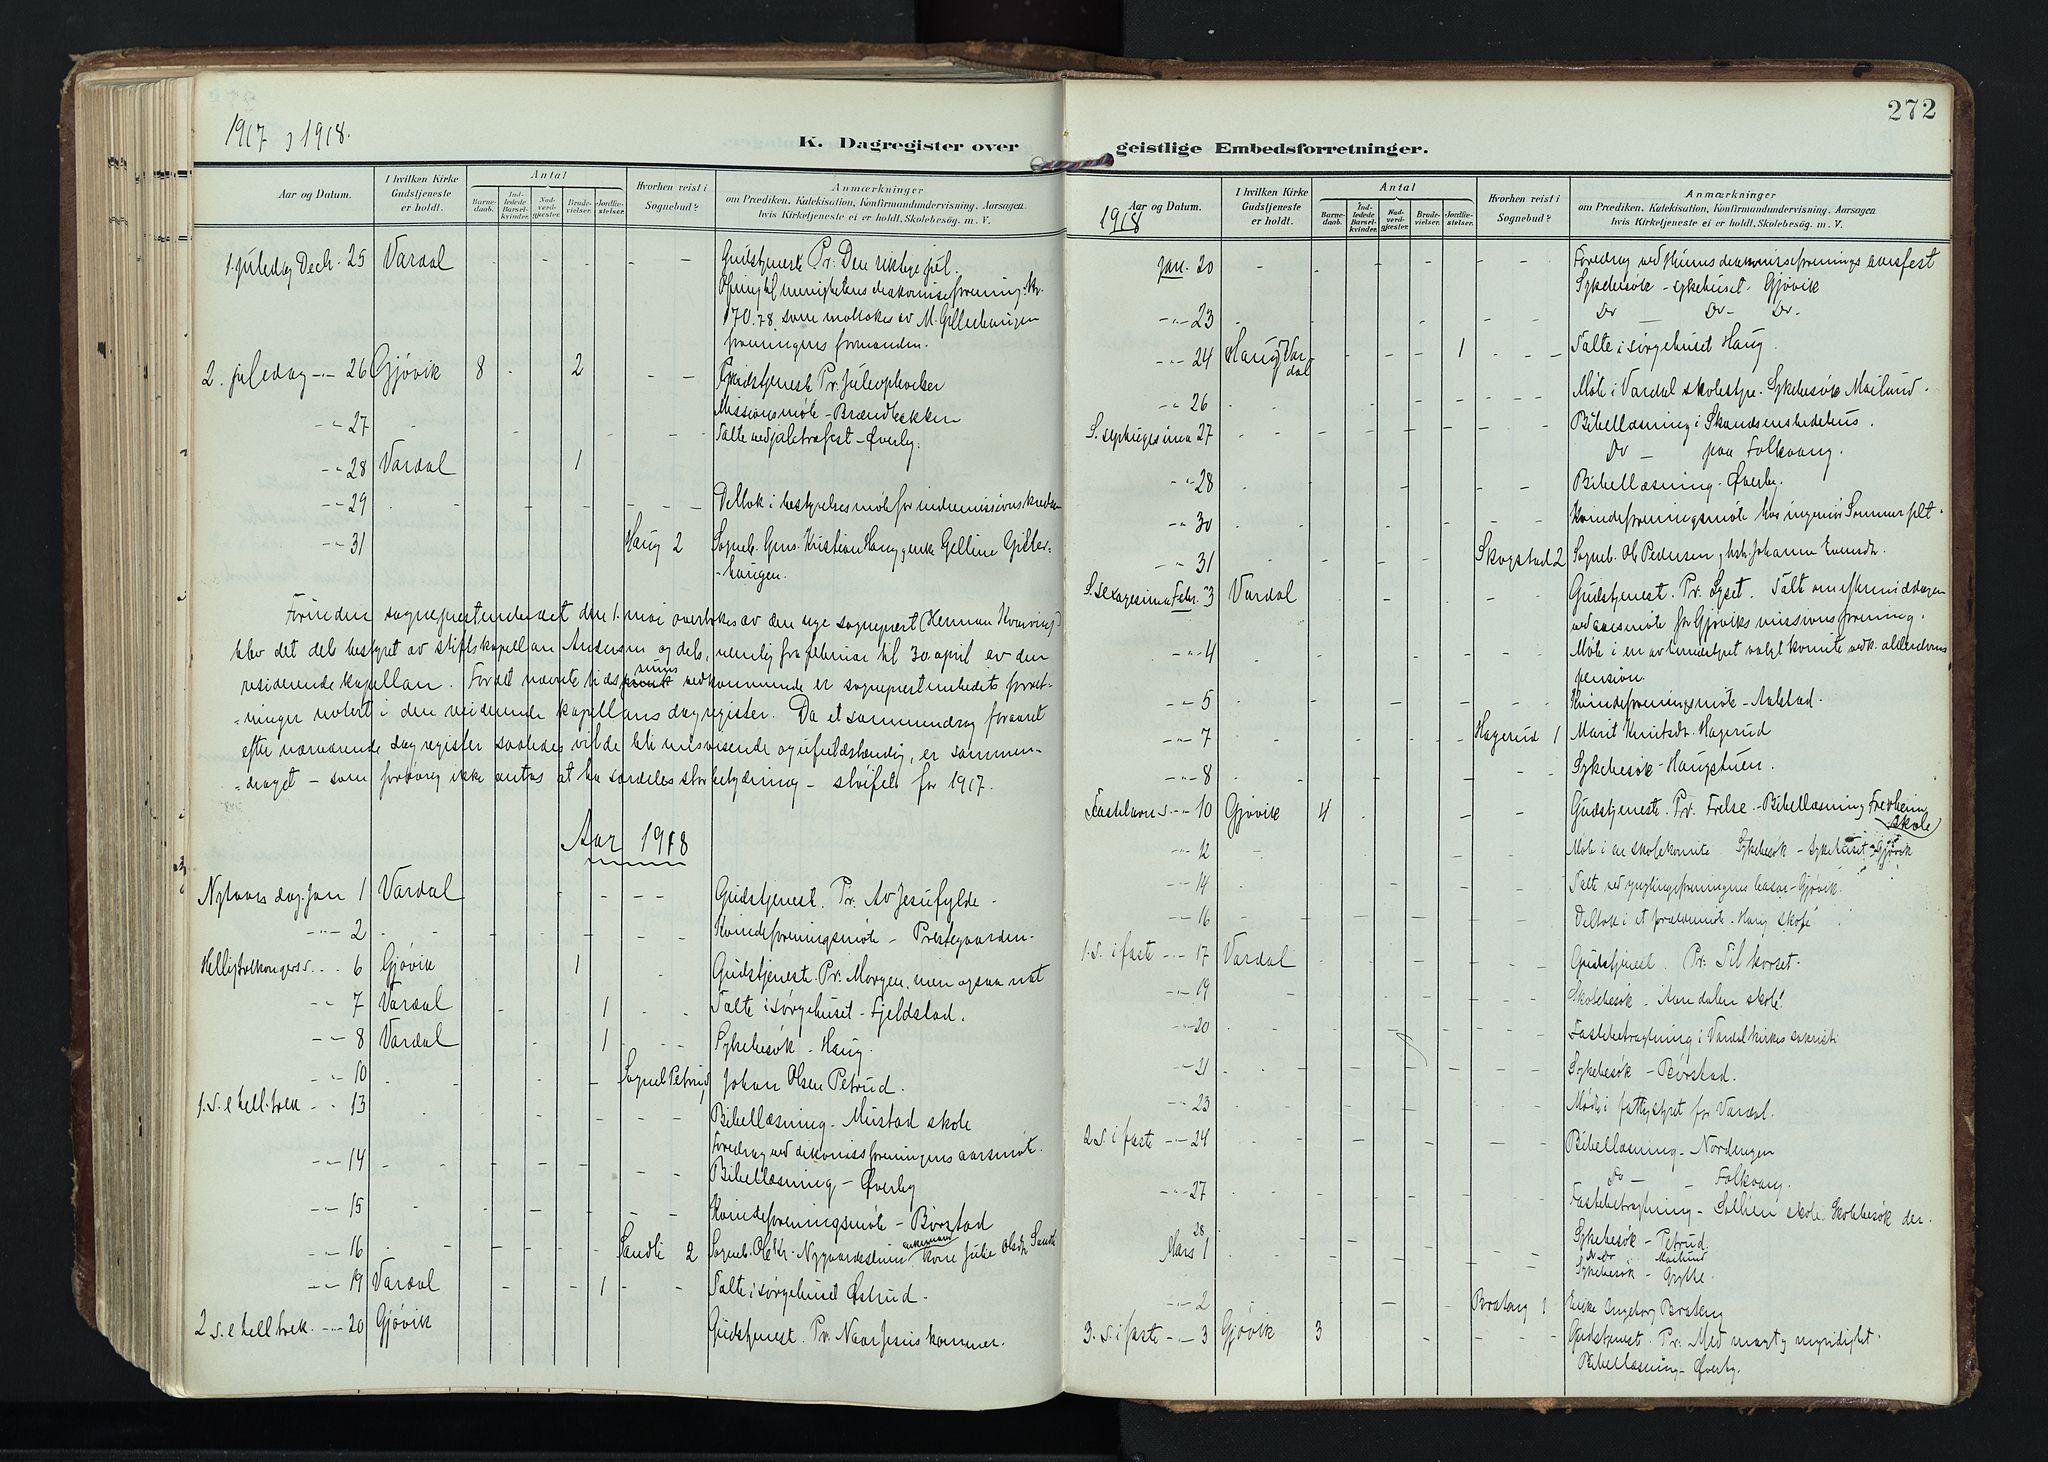 SAH, Vardal prestekontor, H/Ha/Haa/L0020: Ministerialbok nr. 20, 1907-1921, s. 272